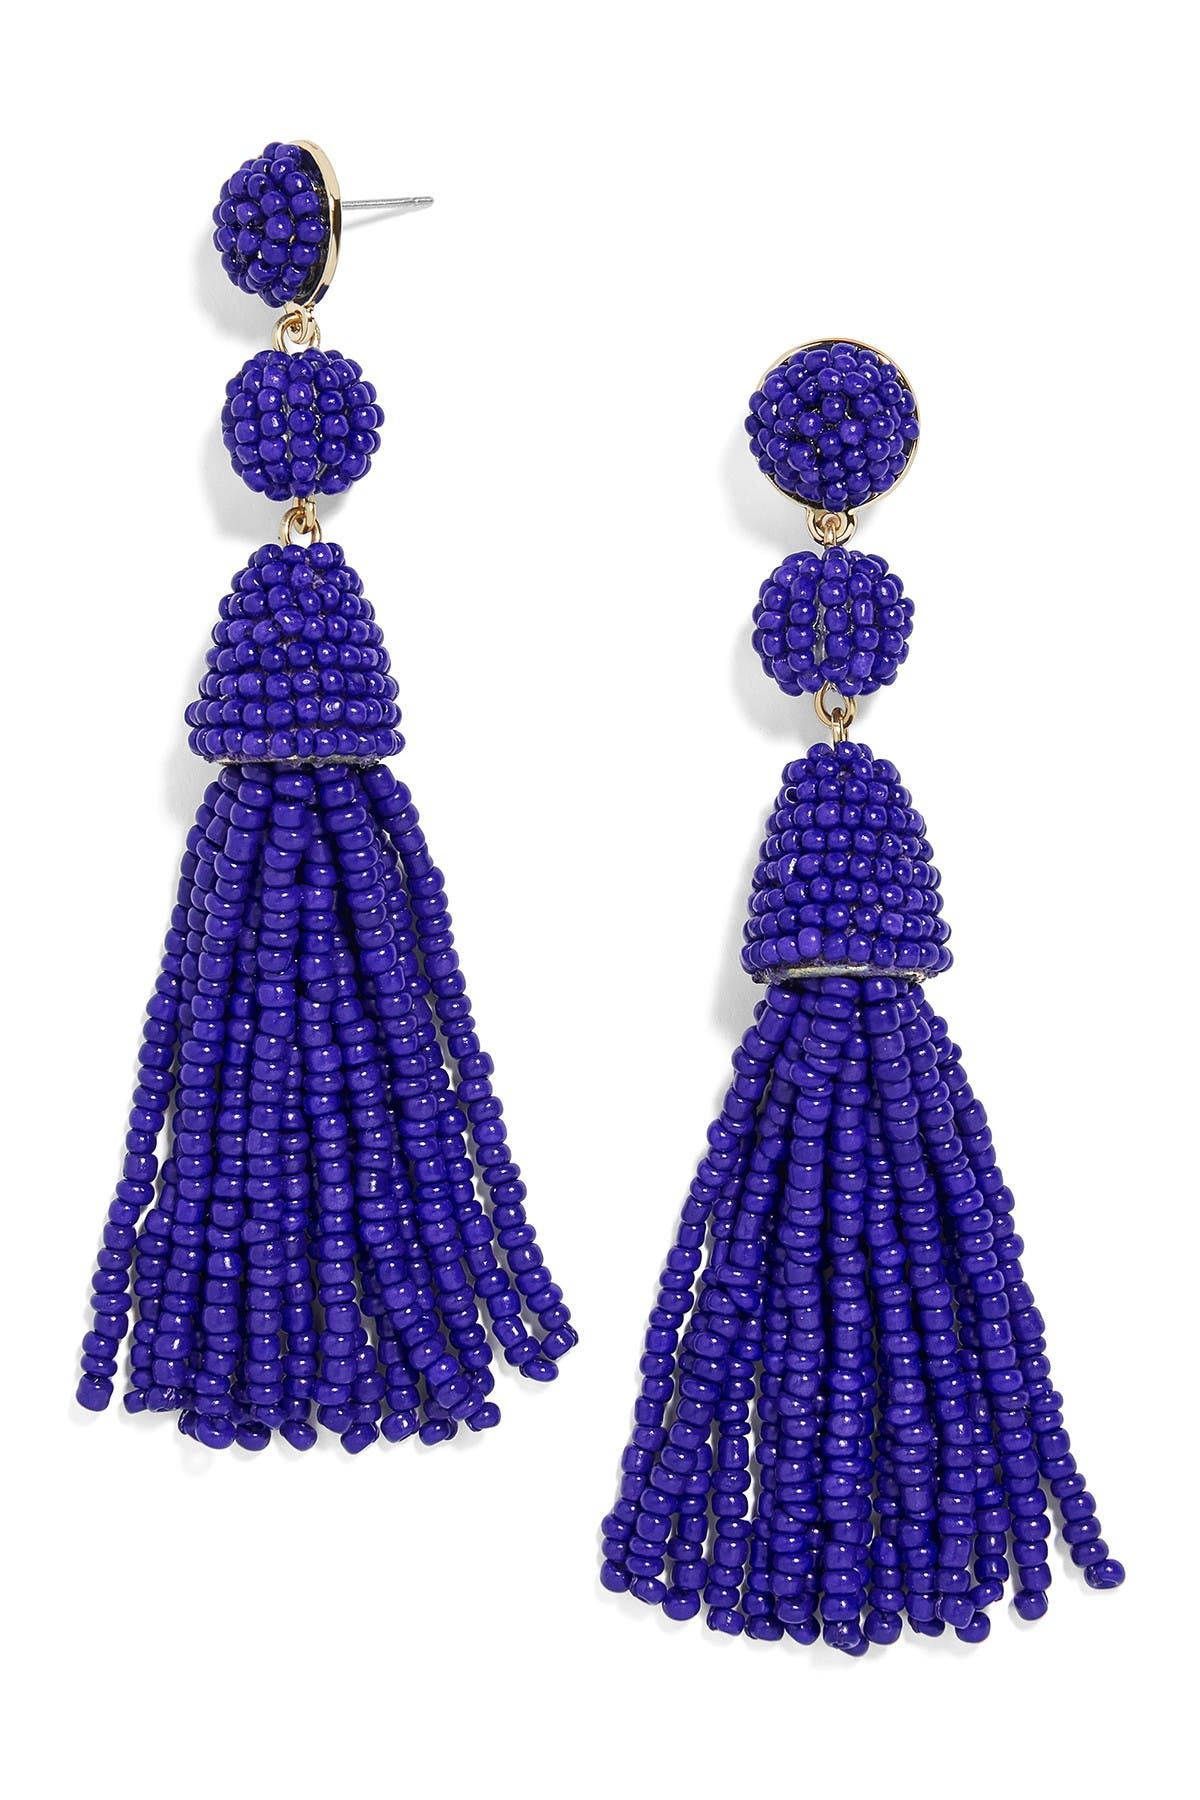 Image of BAUBLEBAR Granita Beaded Tassel Earrings